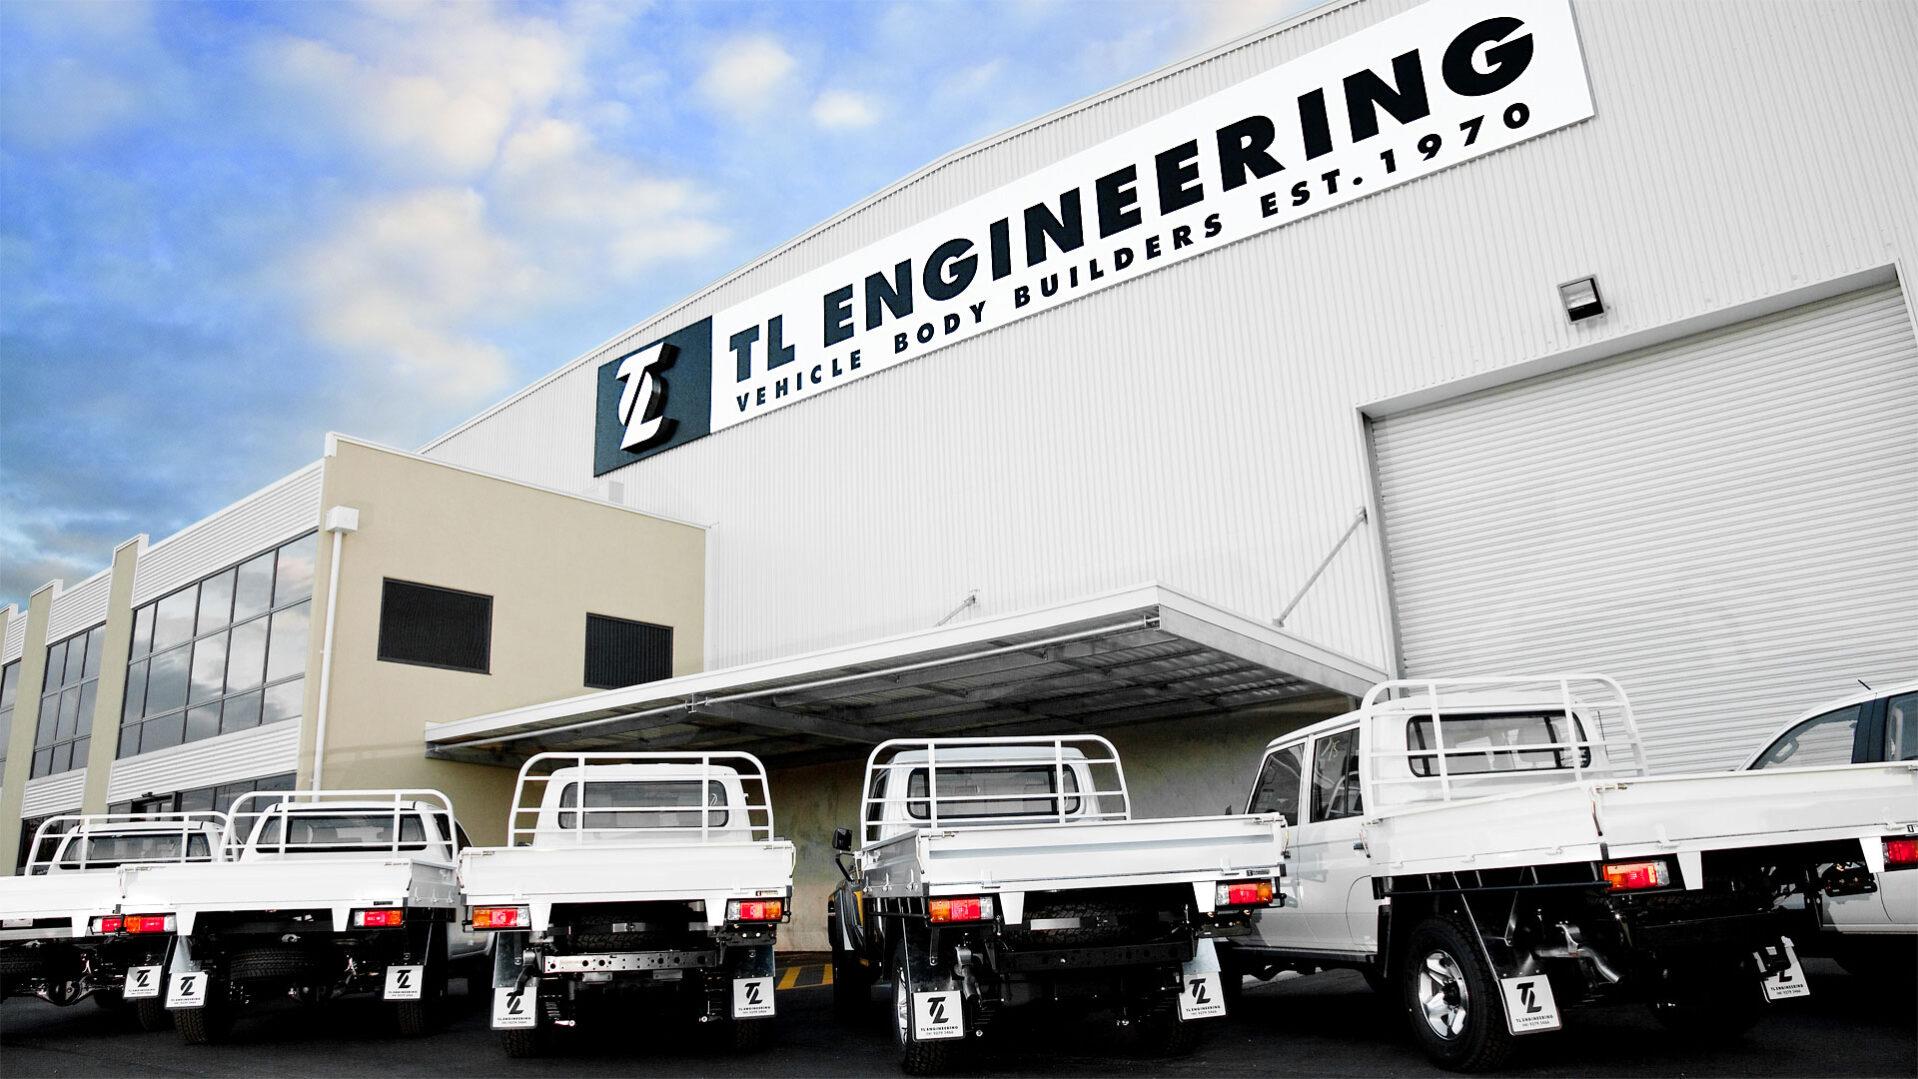 Contact-TruckBody-Builder-Perth